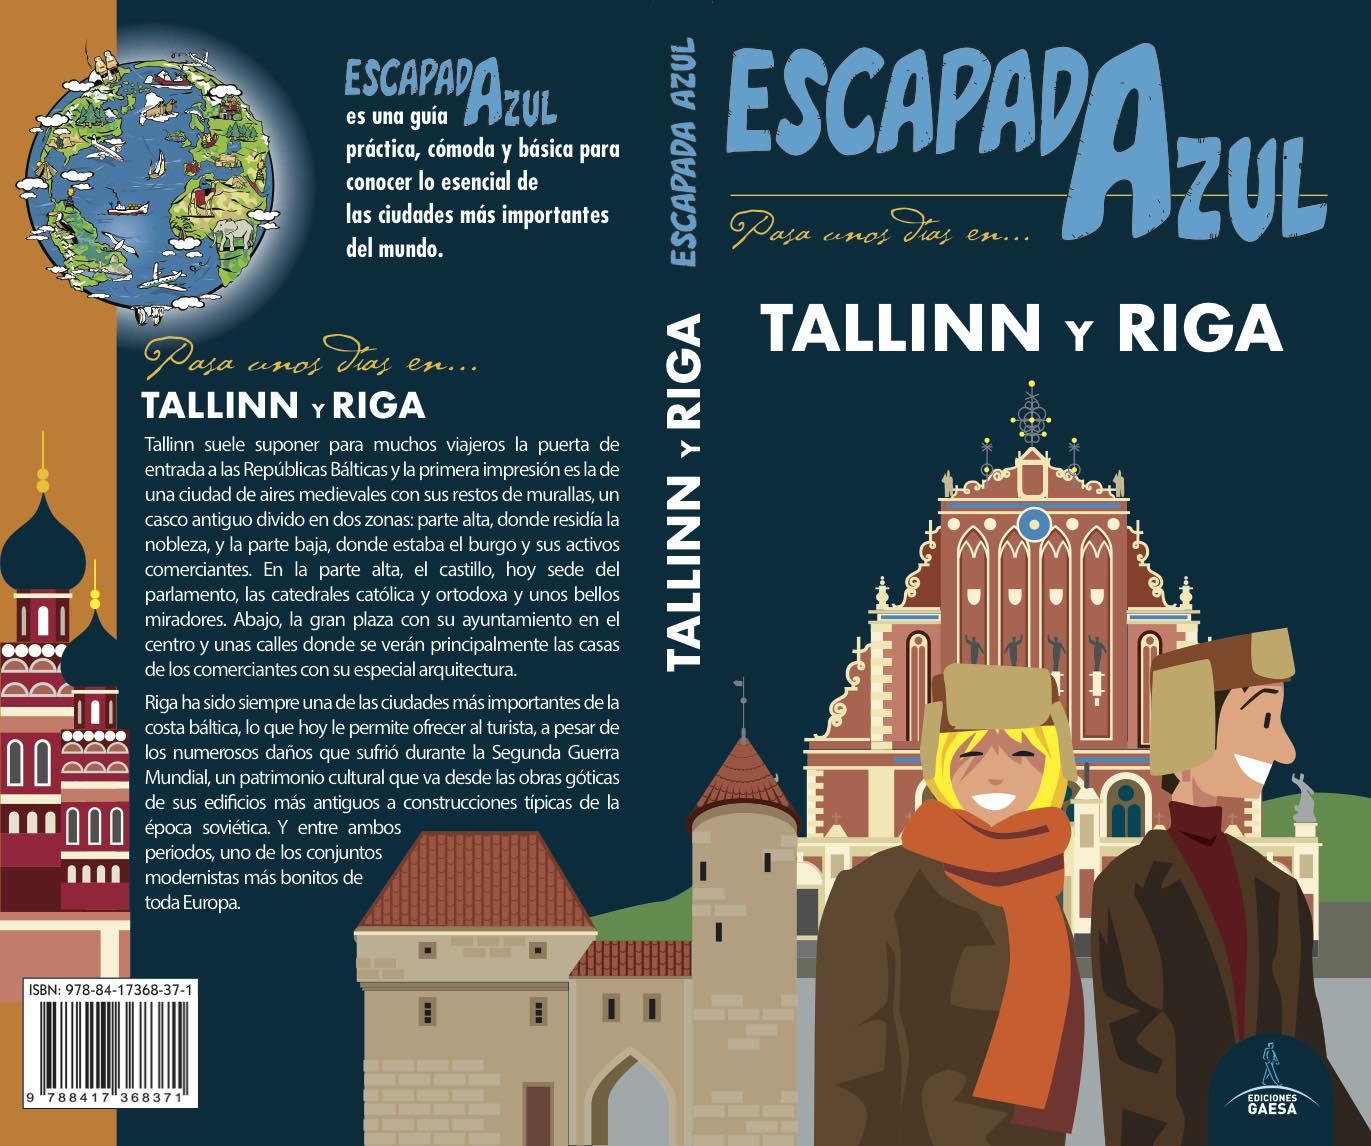 tallinn y riga 2018 (escapada azul) 3ª ed.-angel ingelmo sanchez-9788417368371